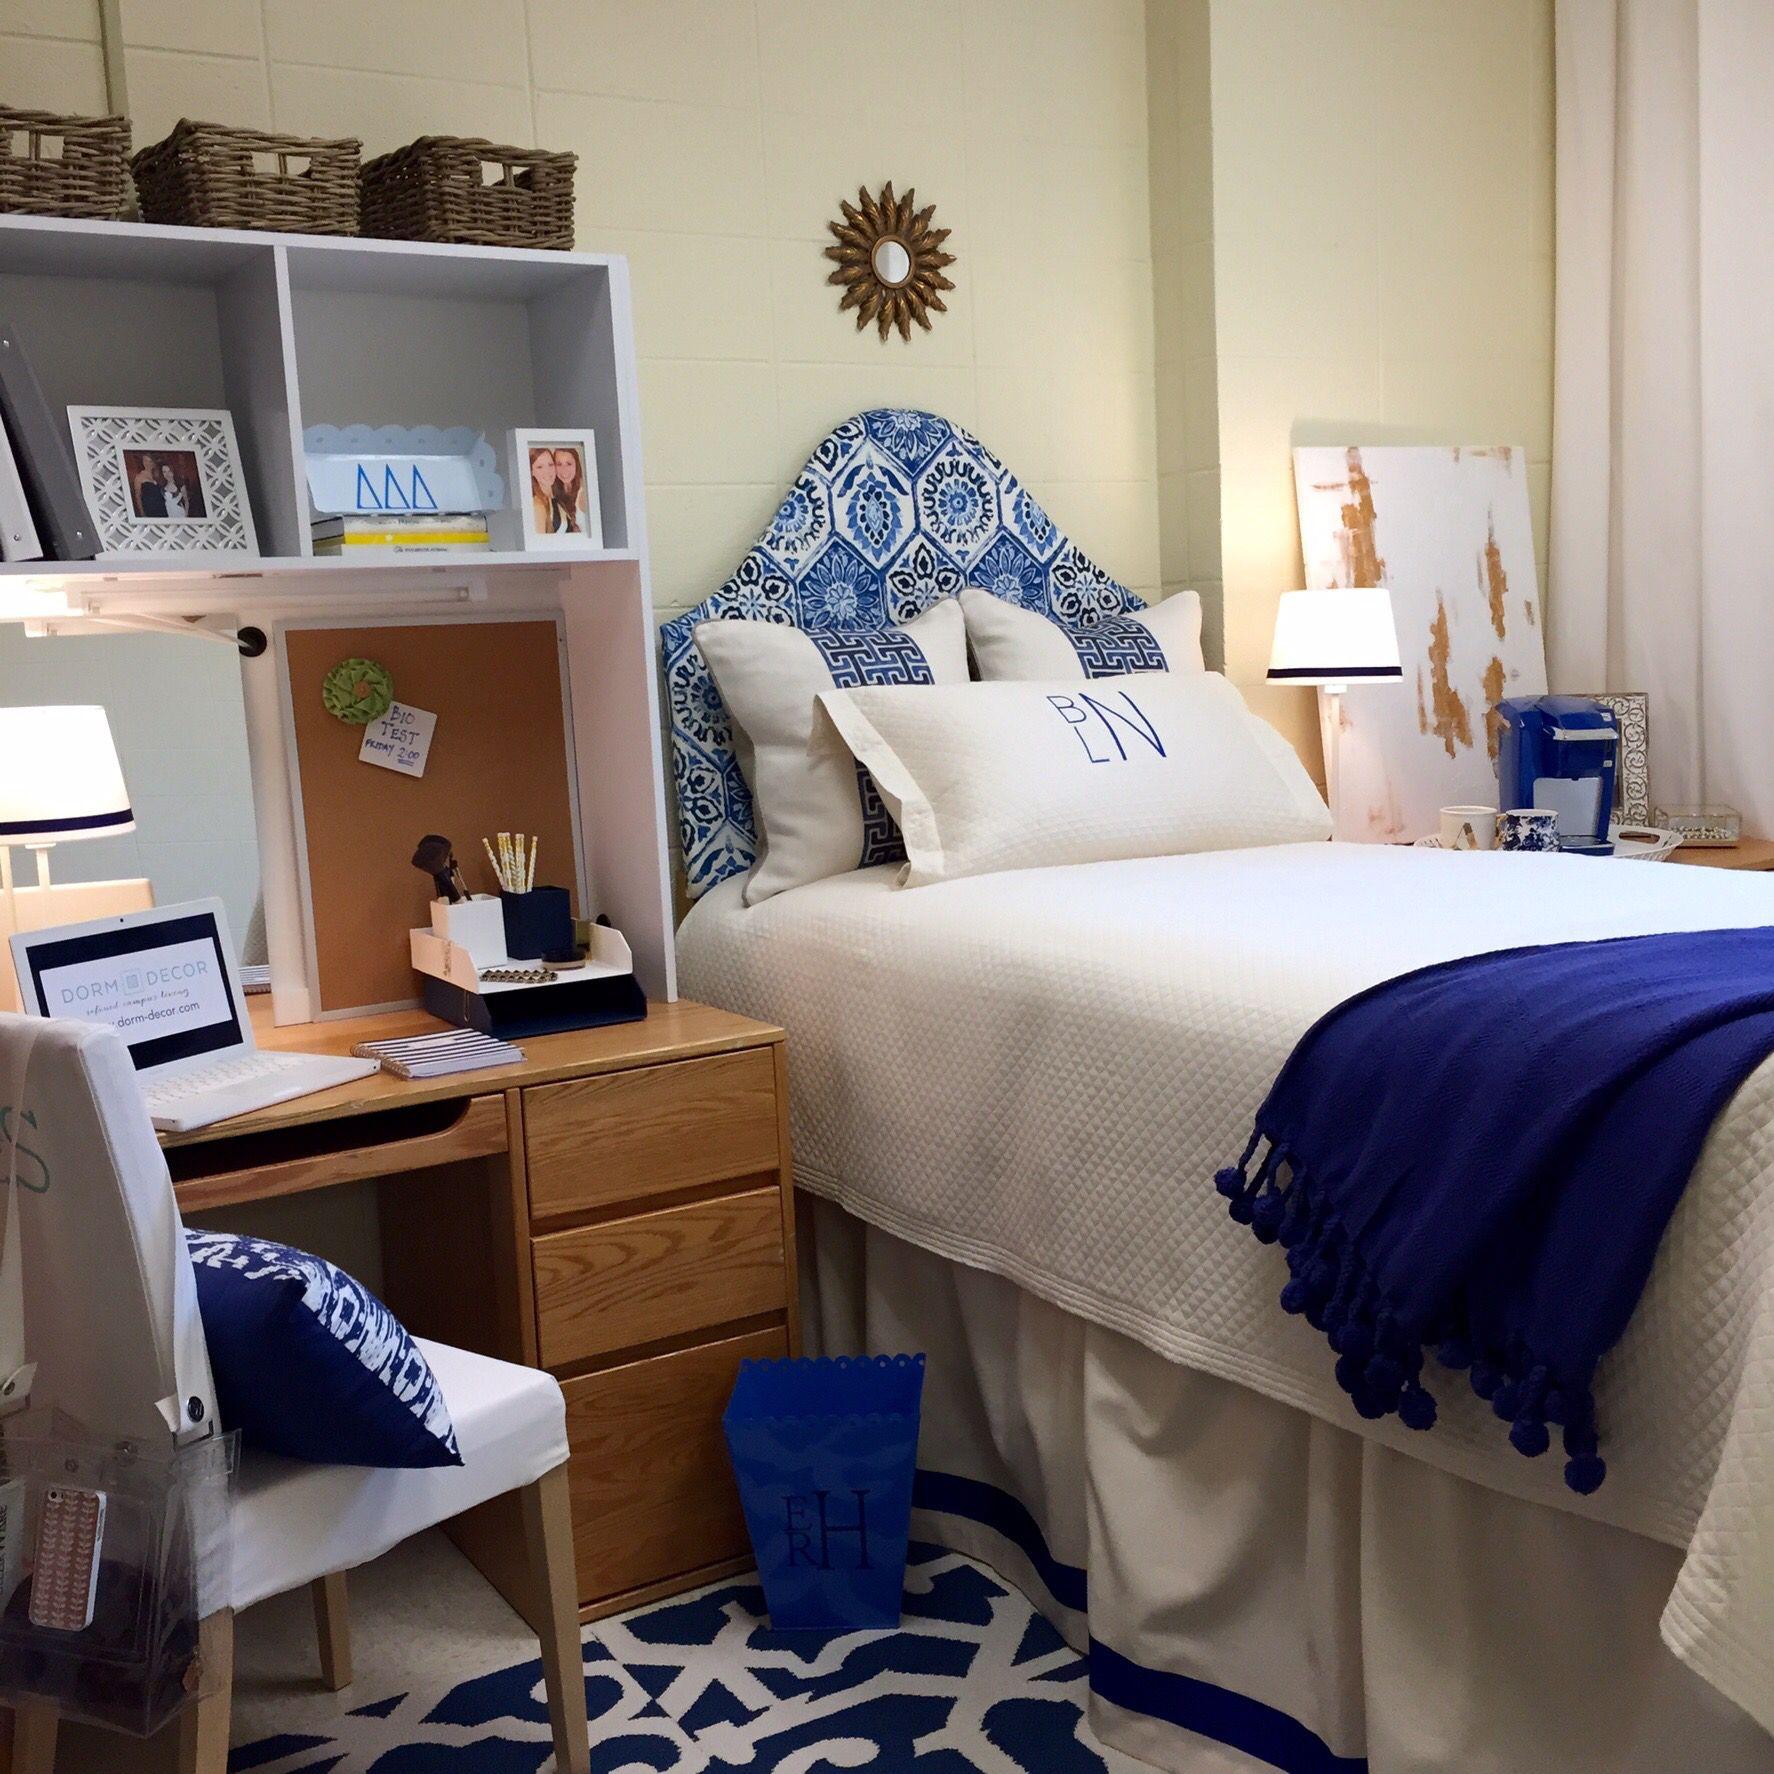 Dorm-Decor Presents Our 2015 Designs For The Modern Dorm